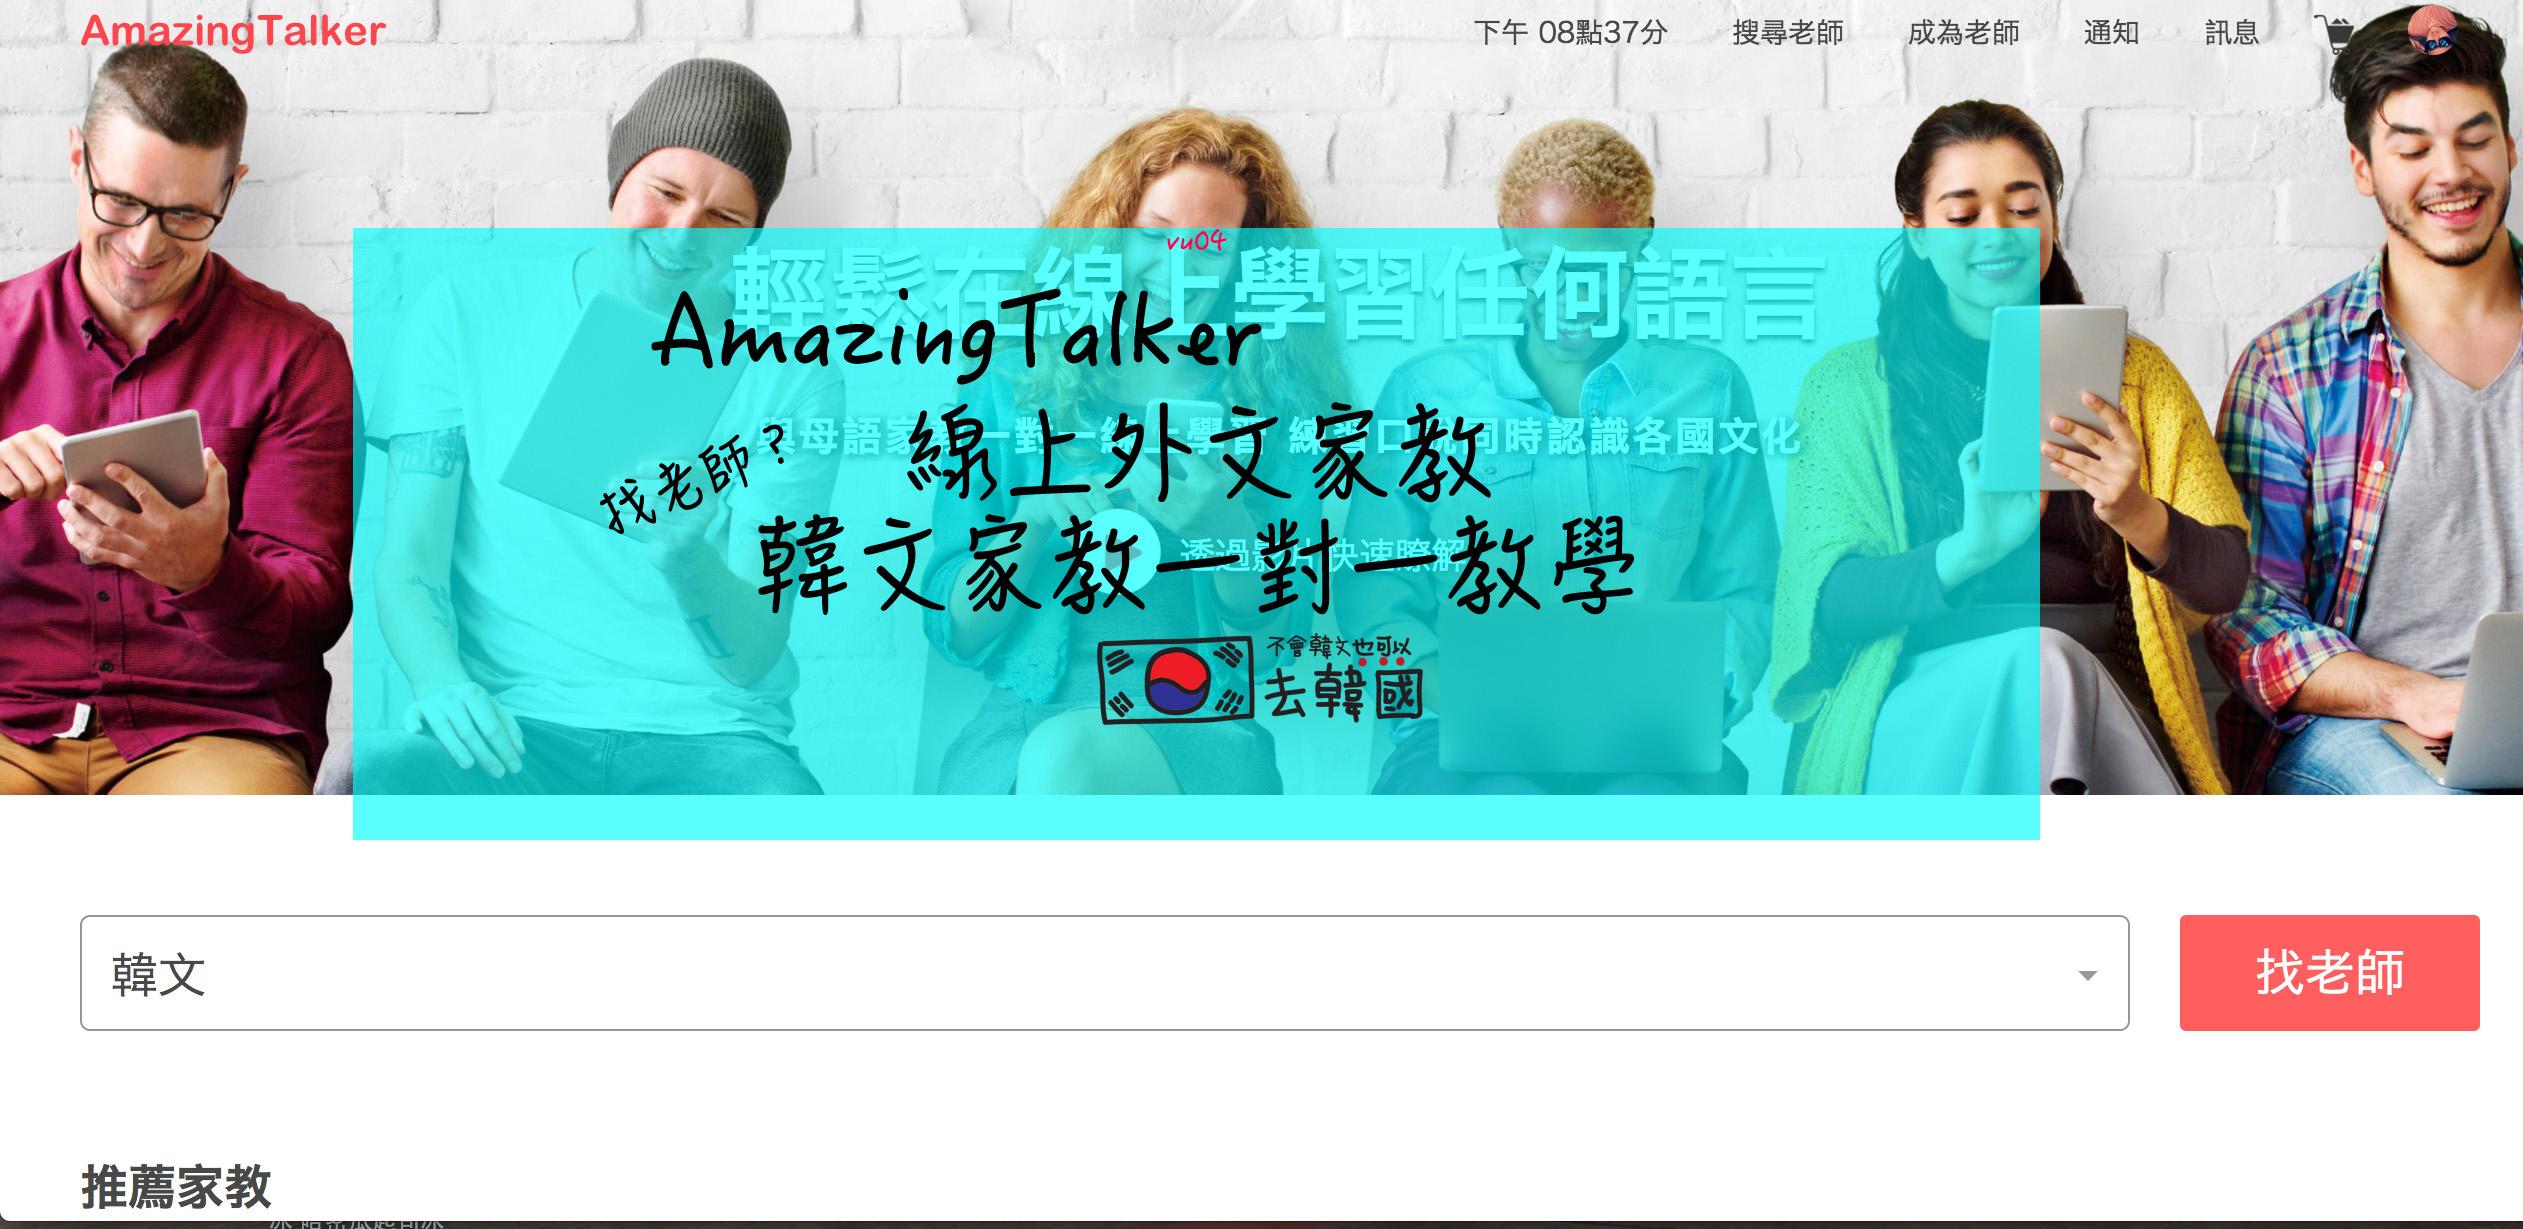 【AmazingTalker評價】在澳洲試線上上課心得|韓英日家教推薦|線上外語家教|學外語、找韓文老師 @GINA環球旅行生活|不會韓文也可以去韓國